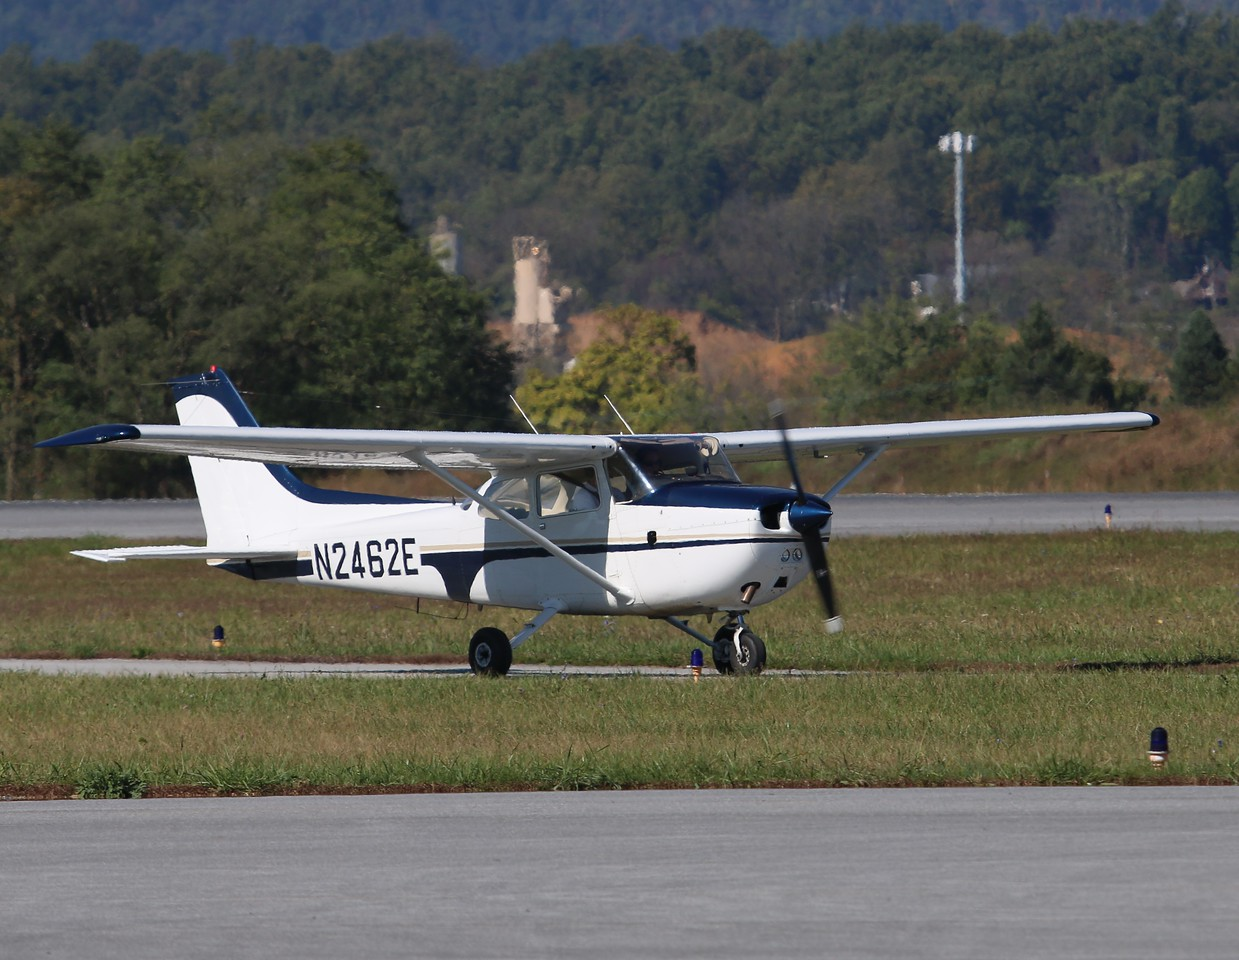 Aircraft utilized; Cessna 172 [N2462E]